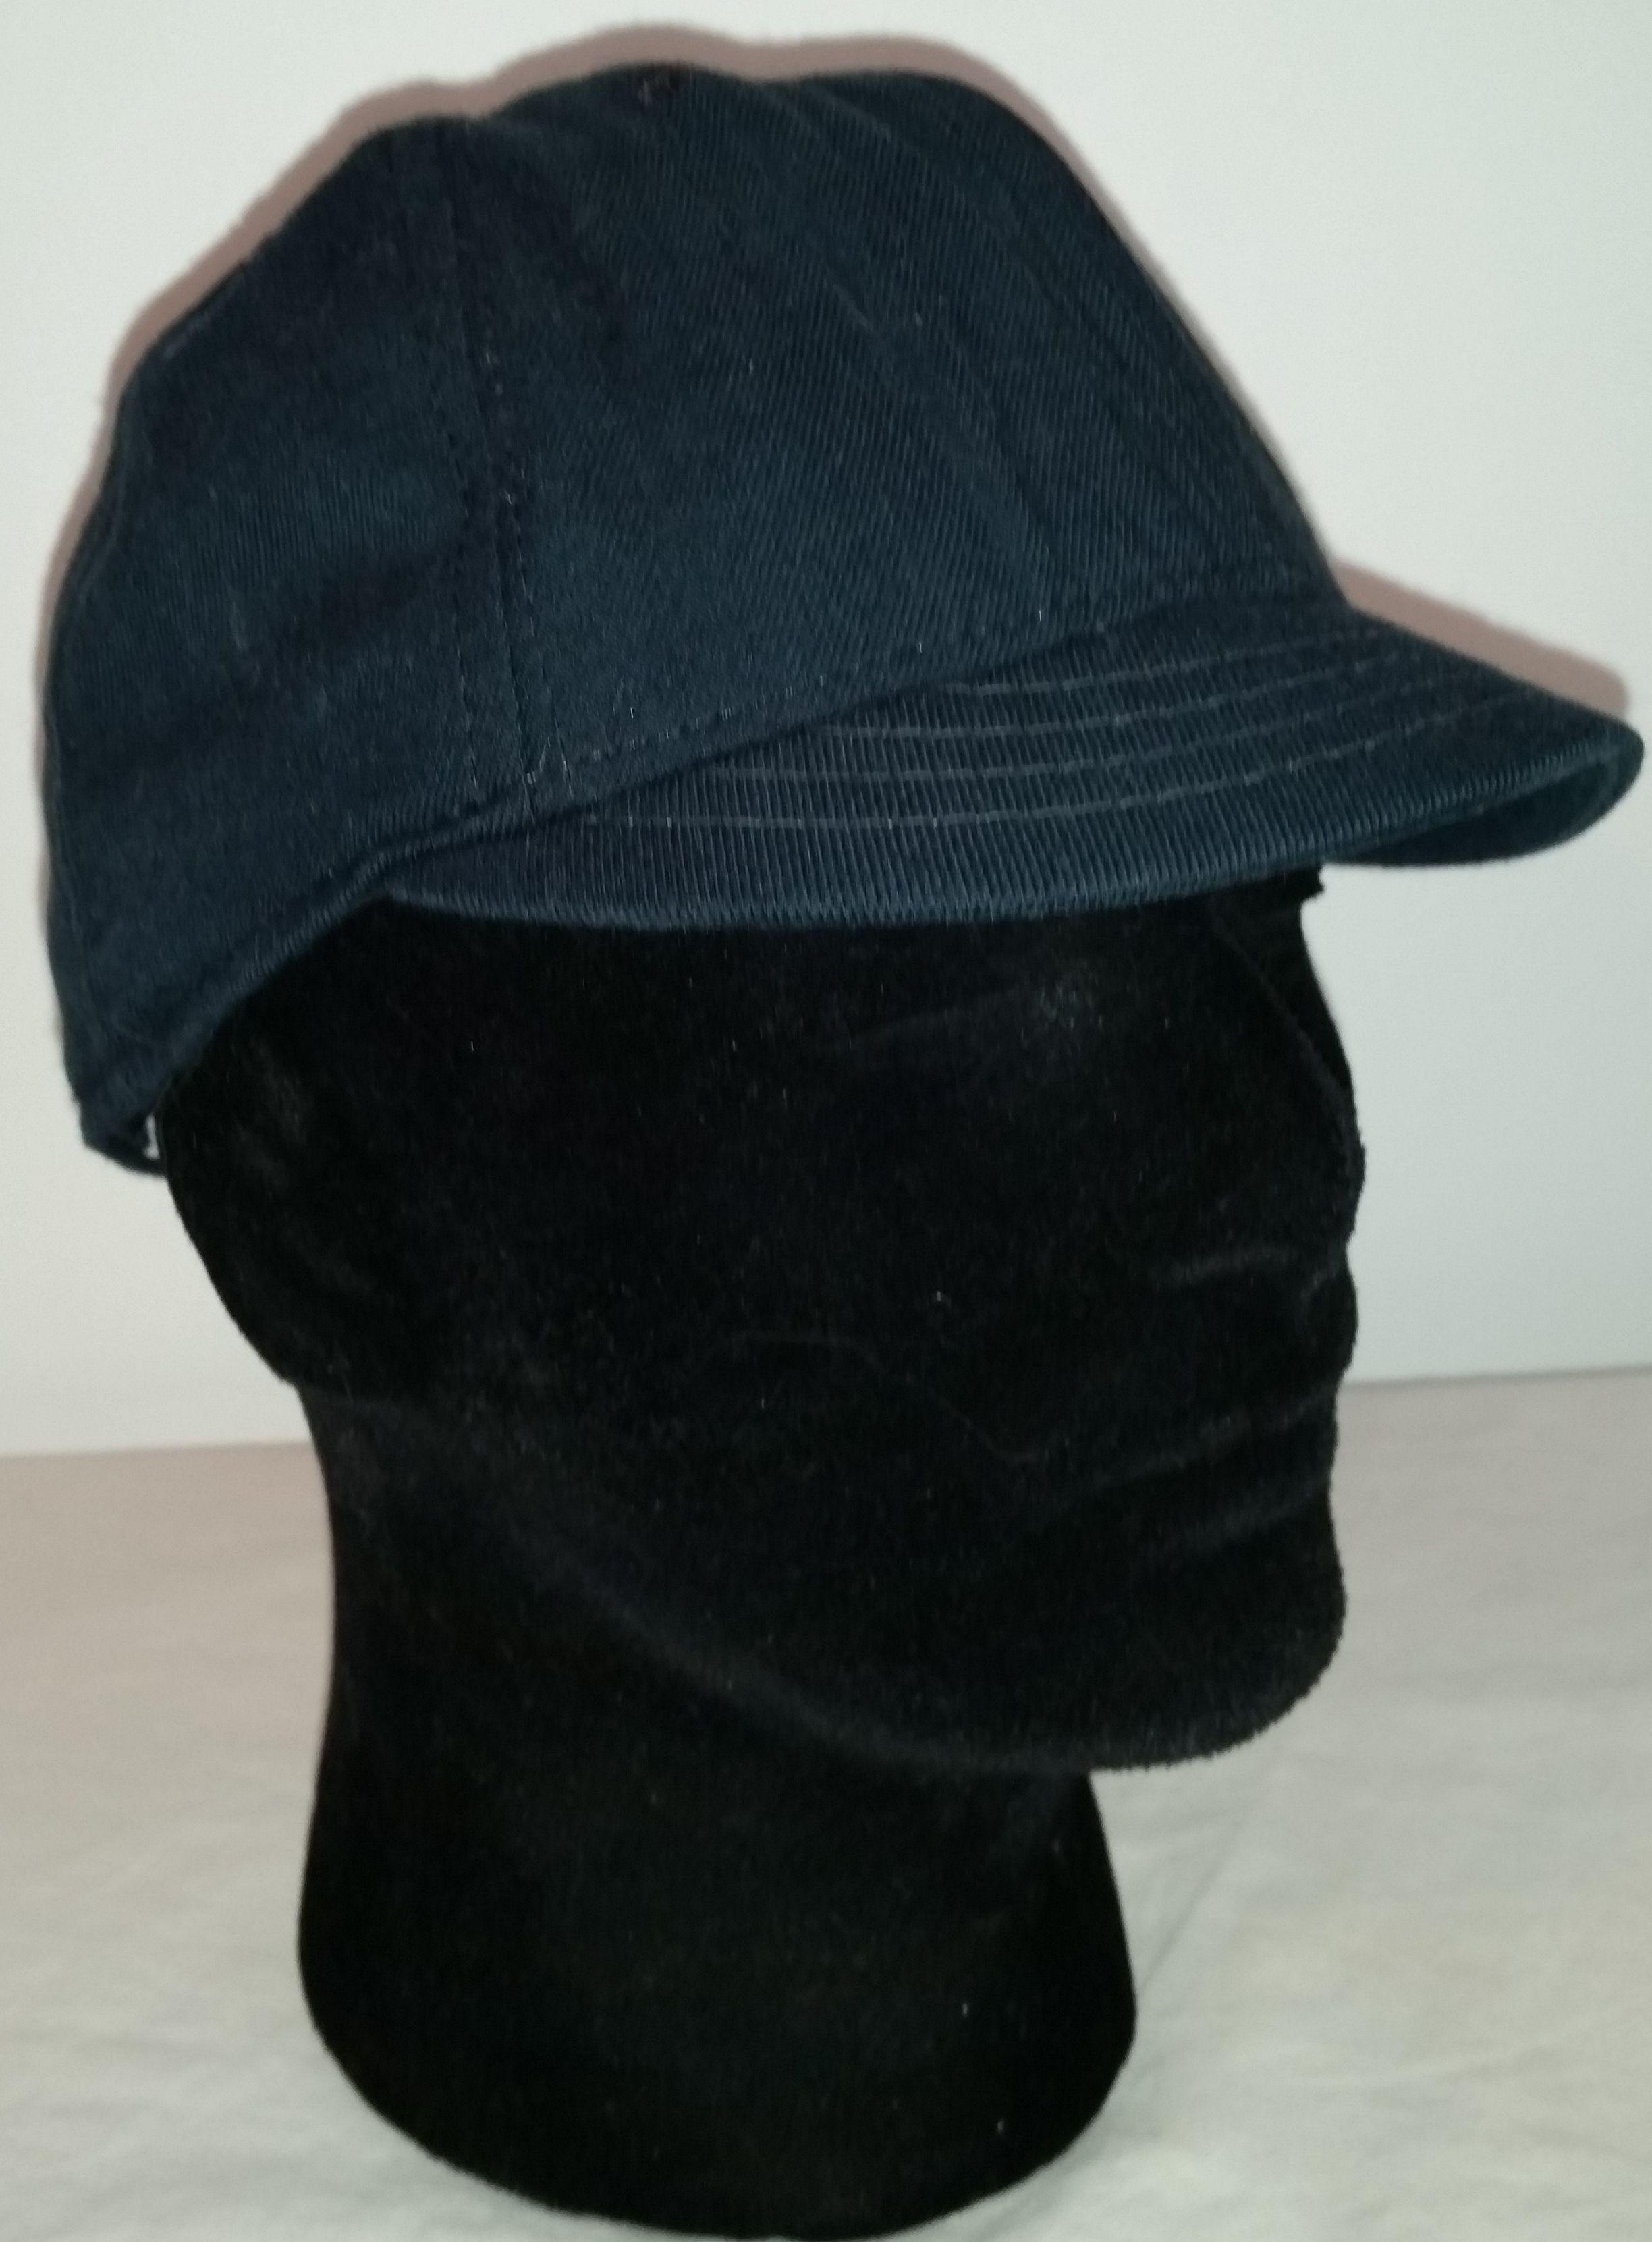 Vintage 70s Ds New Era Umpire Short Brim Baseball Hat 7 3 8 Baseball Hats Vintage 70s New Era